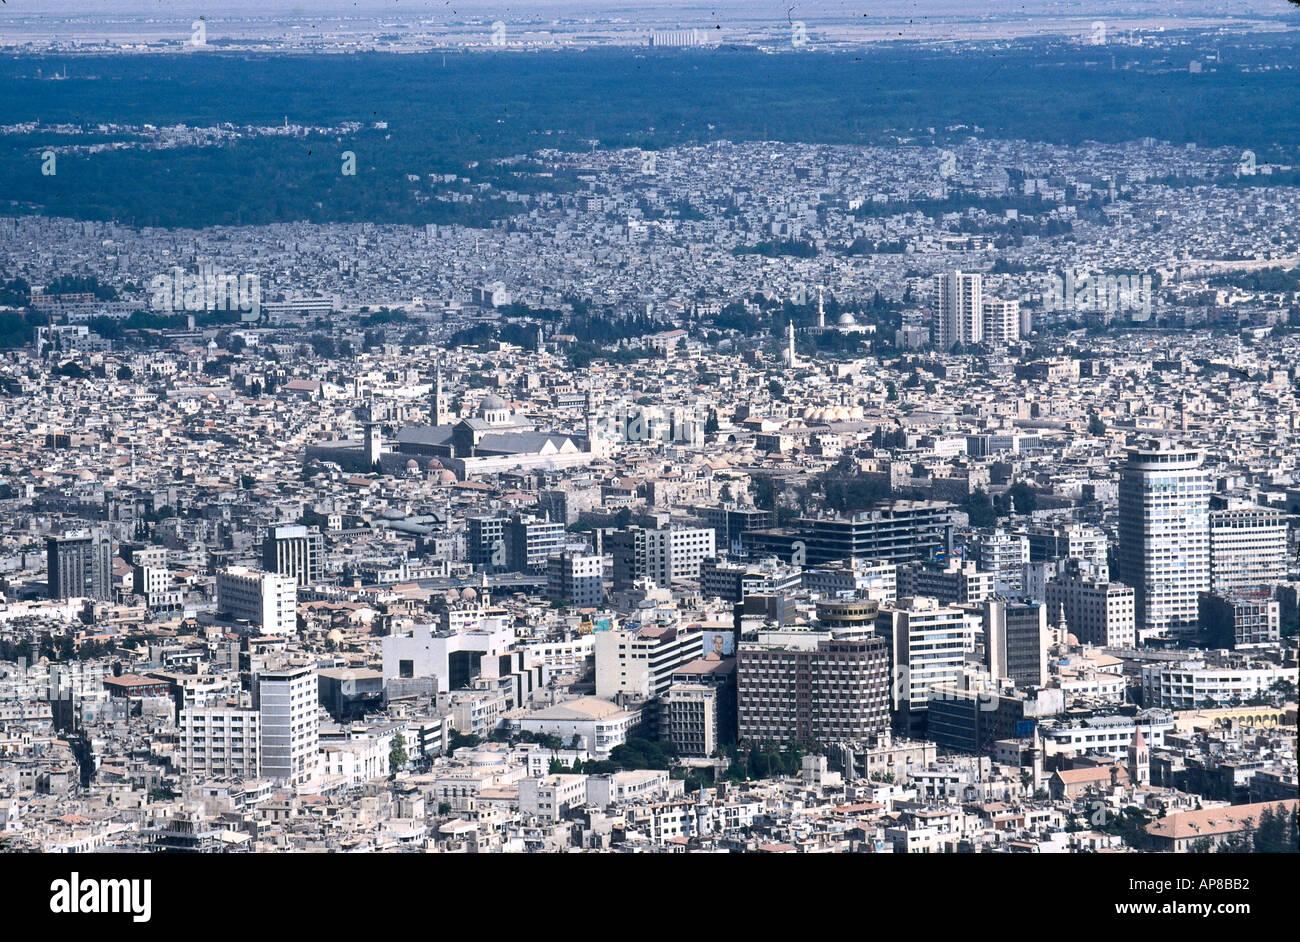 Buildings in city, Al Jarida Al Maghribia, Jebel Qassioun, Damascus, Syria - Stock Image